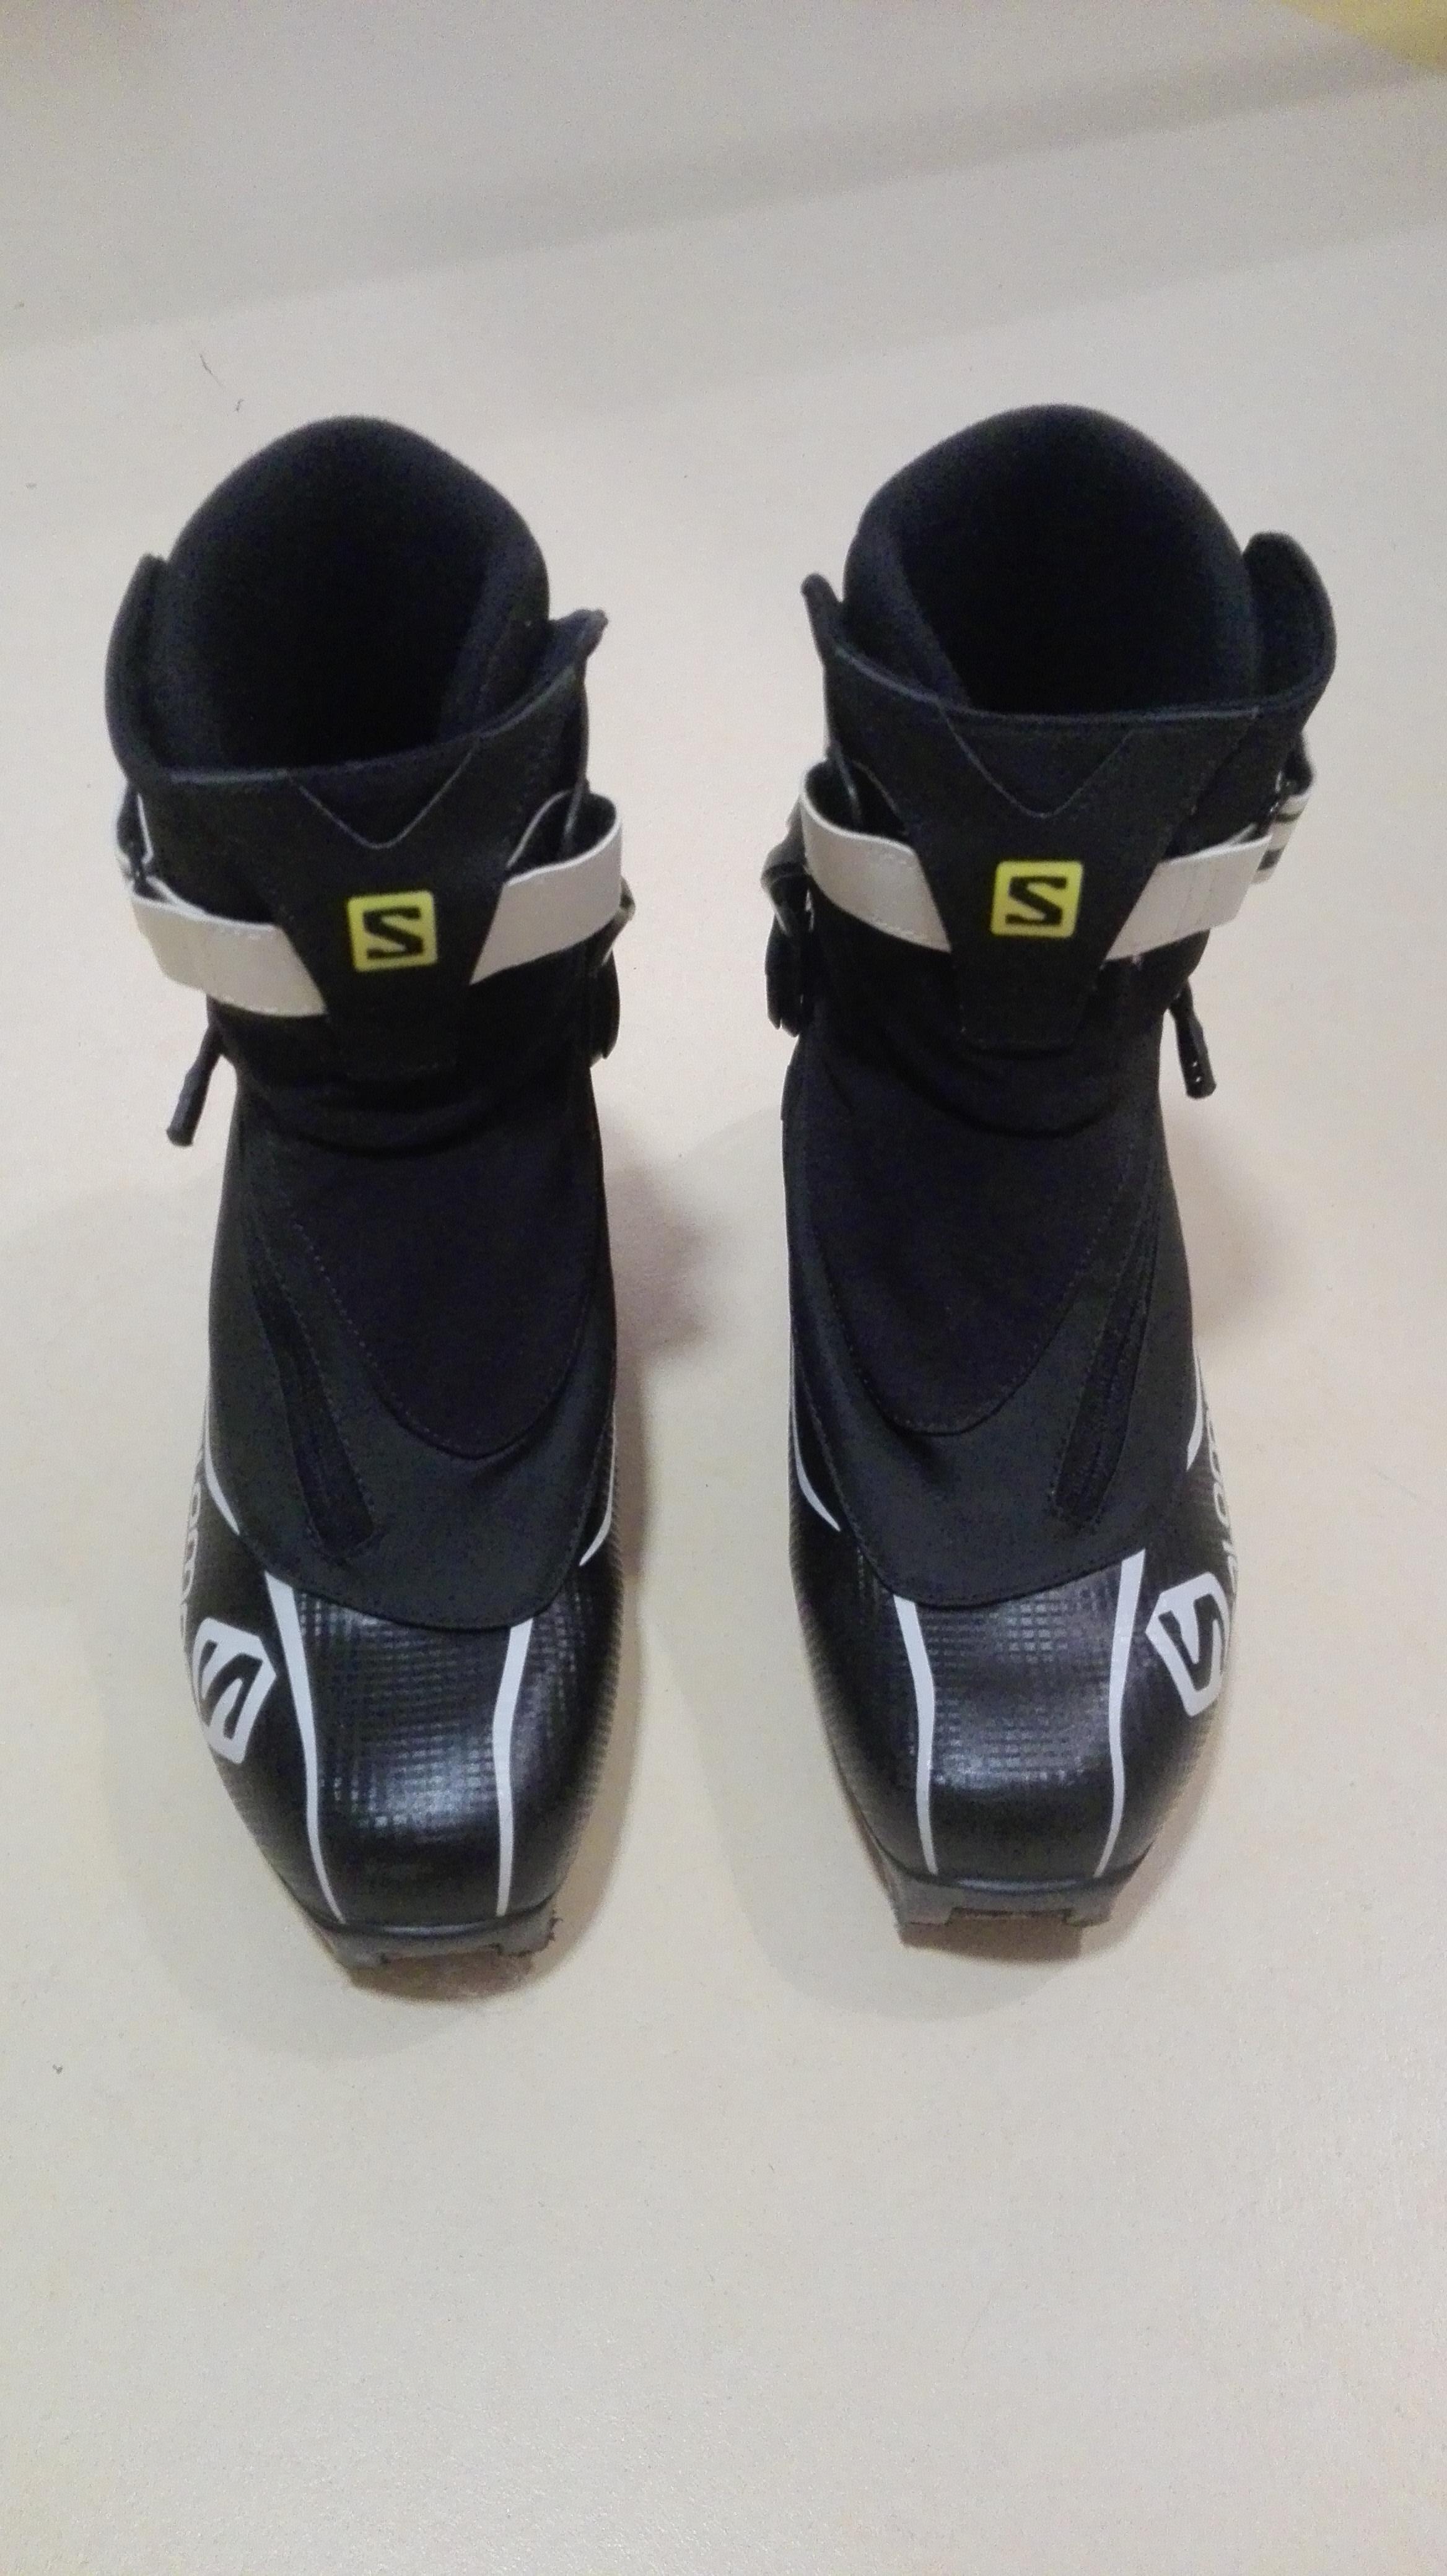 Boty Salomon Equipe 8 Skate vel.44 - Bazar - Běžky.net a2b9a568a26